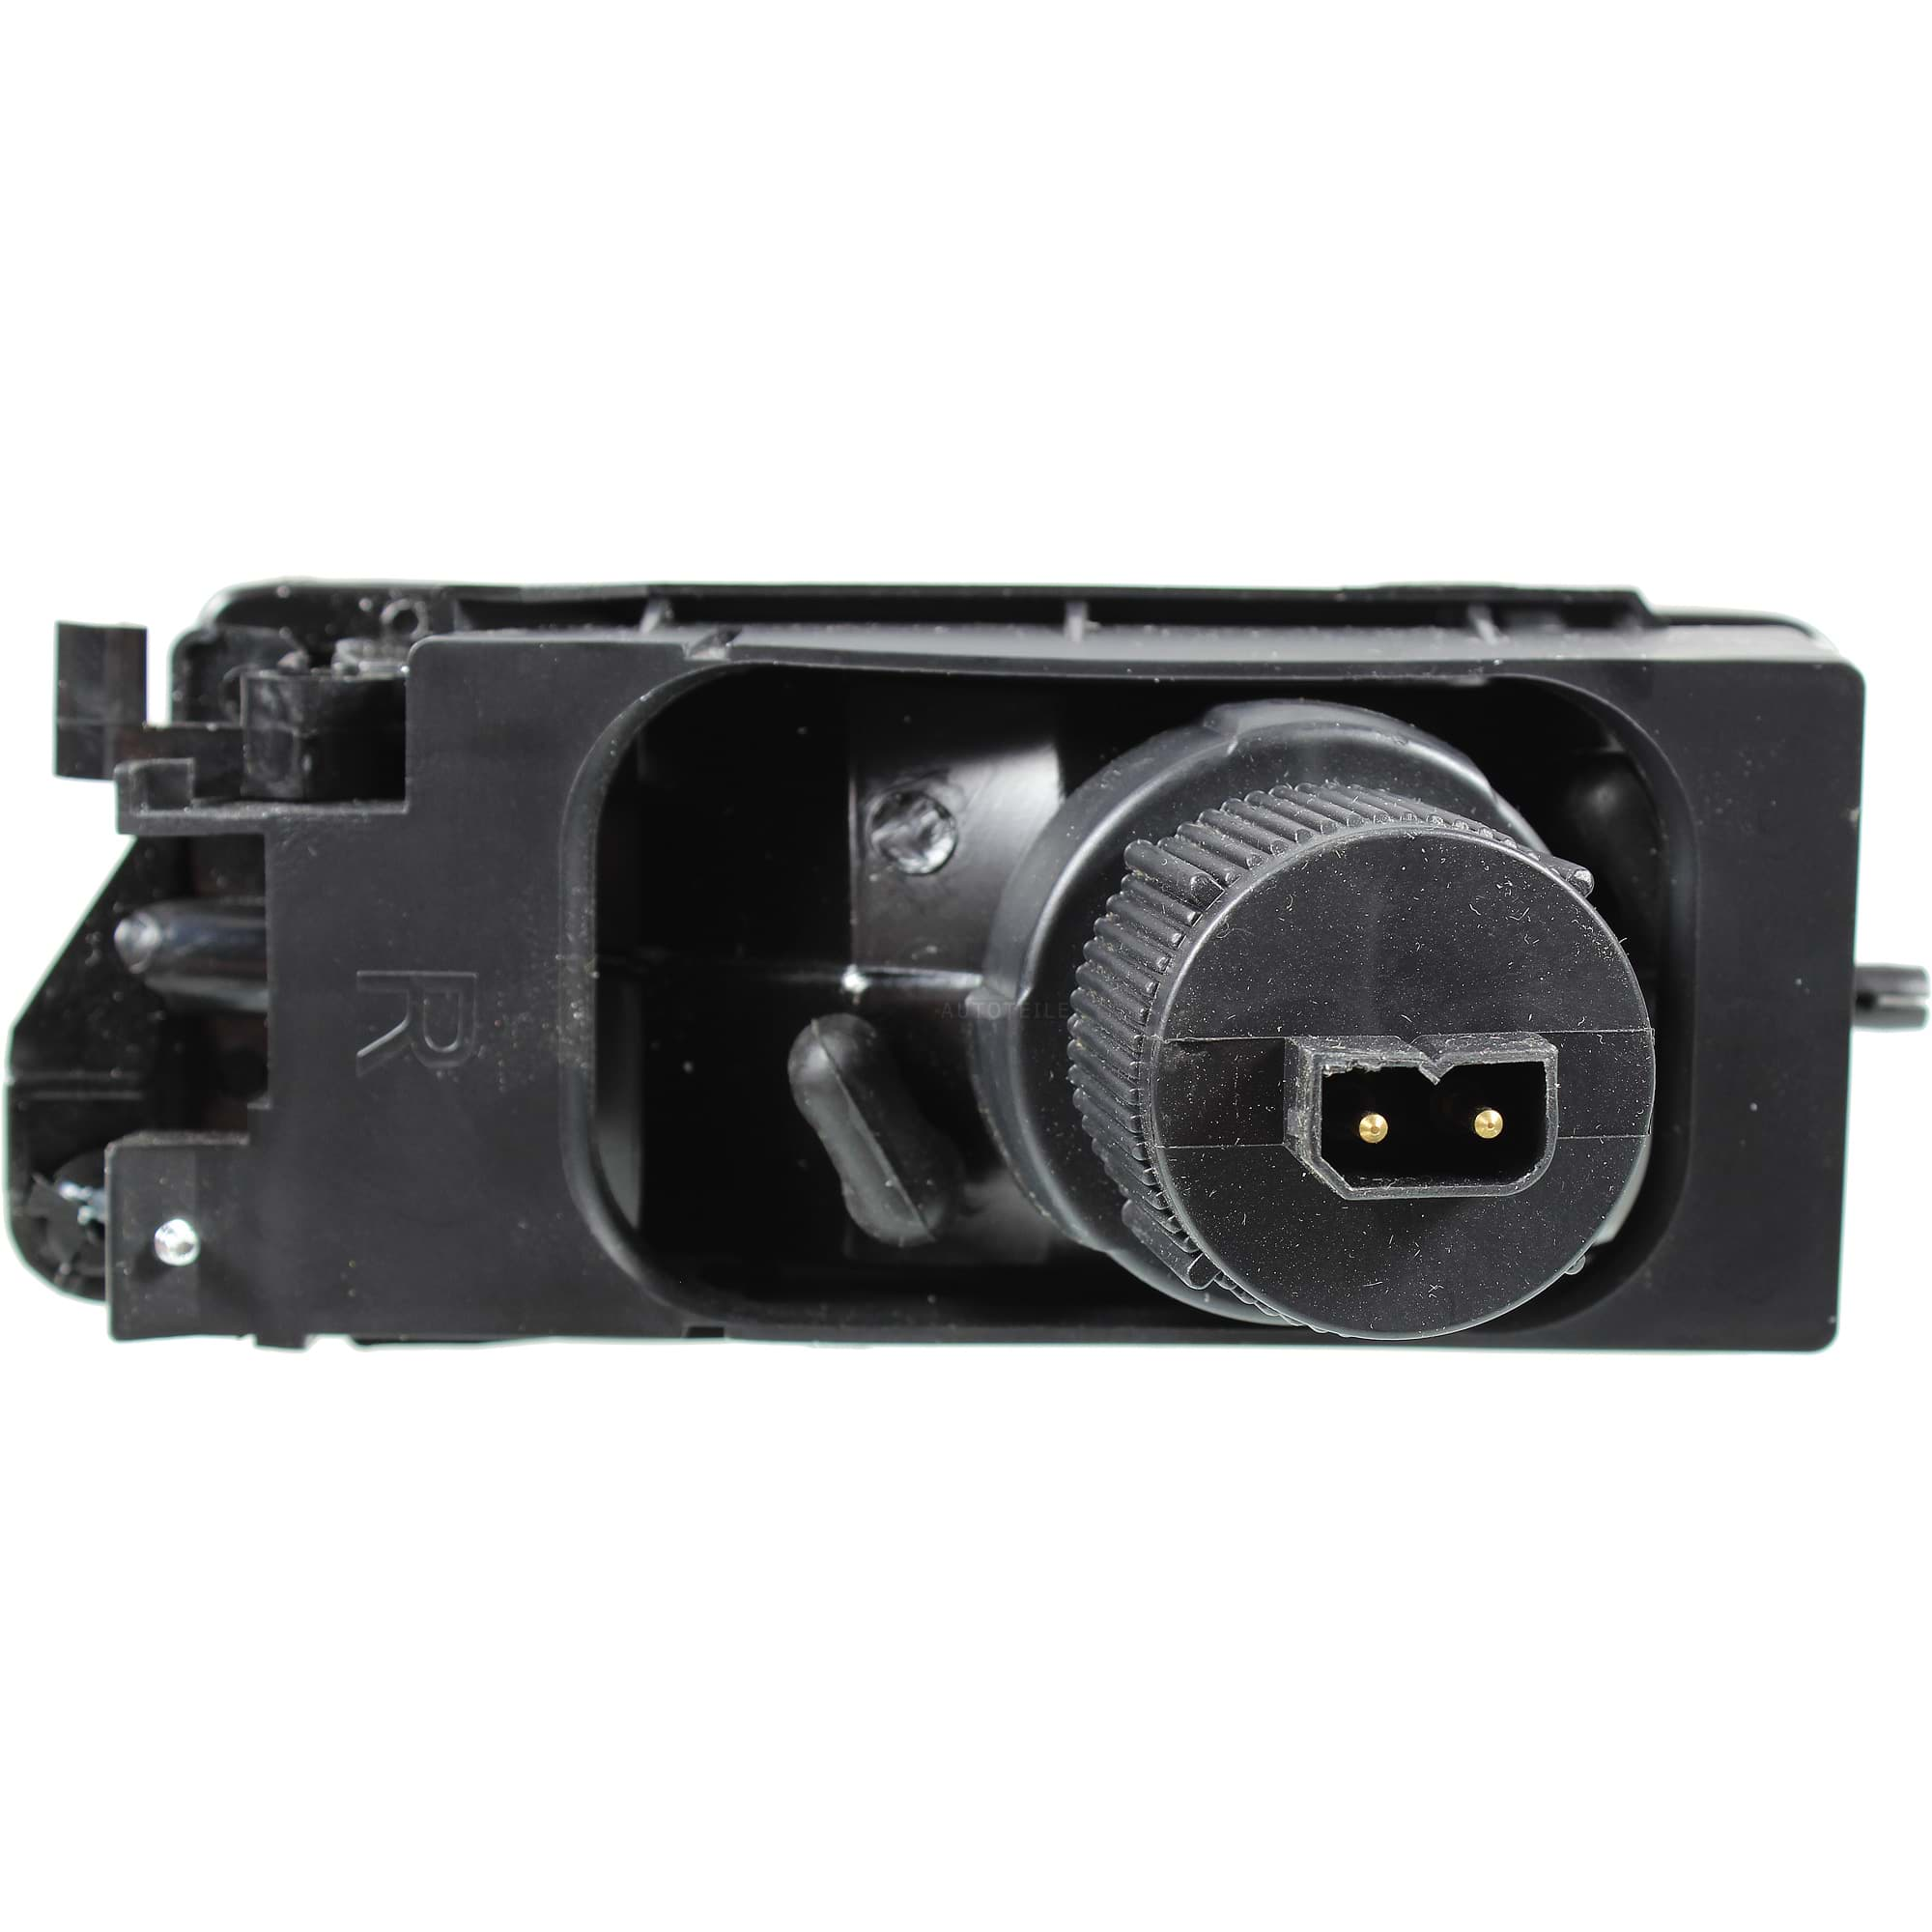 Nebelscheinwerfer Set f/ür 3er E36 Bj 90-99 klar smoke Sport Optik